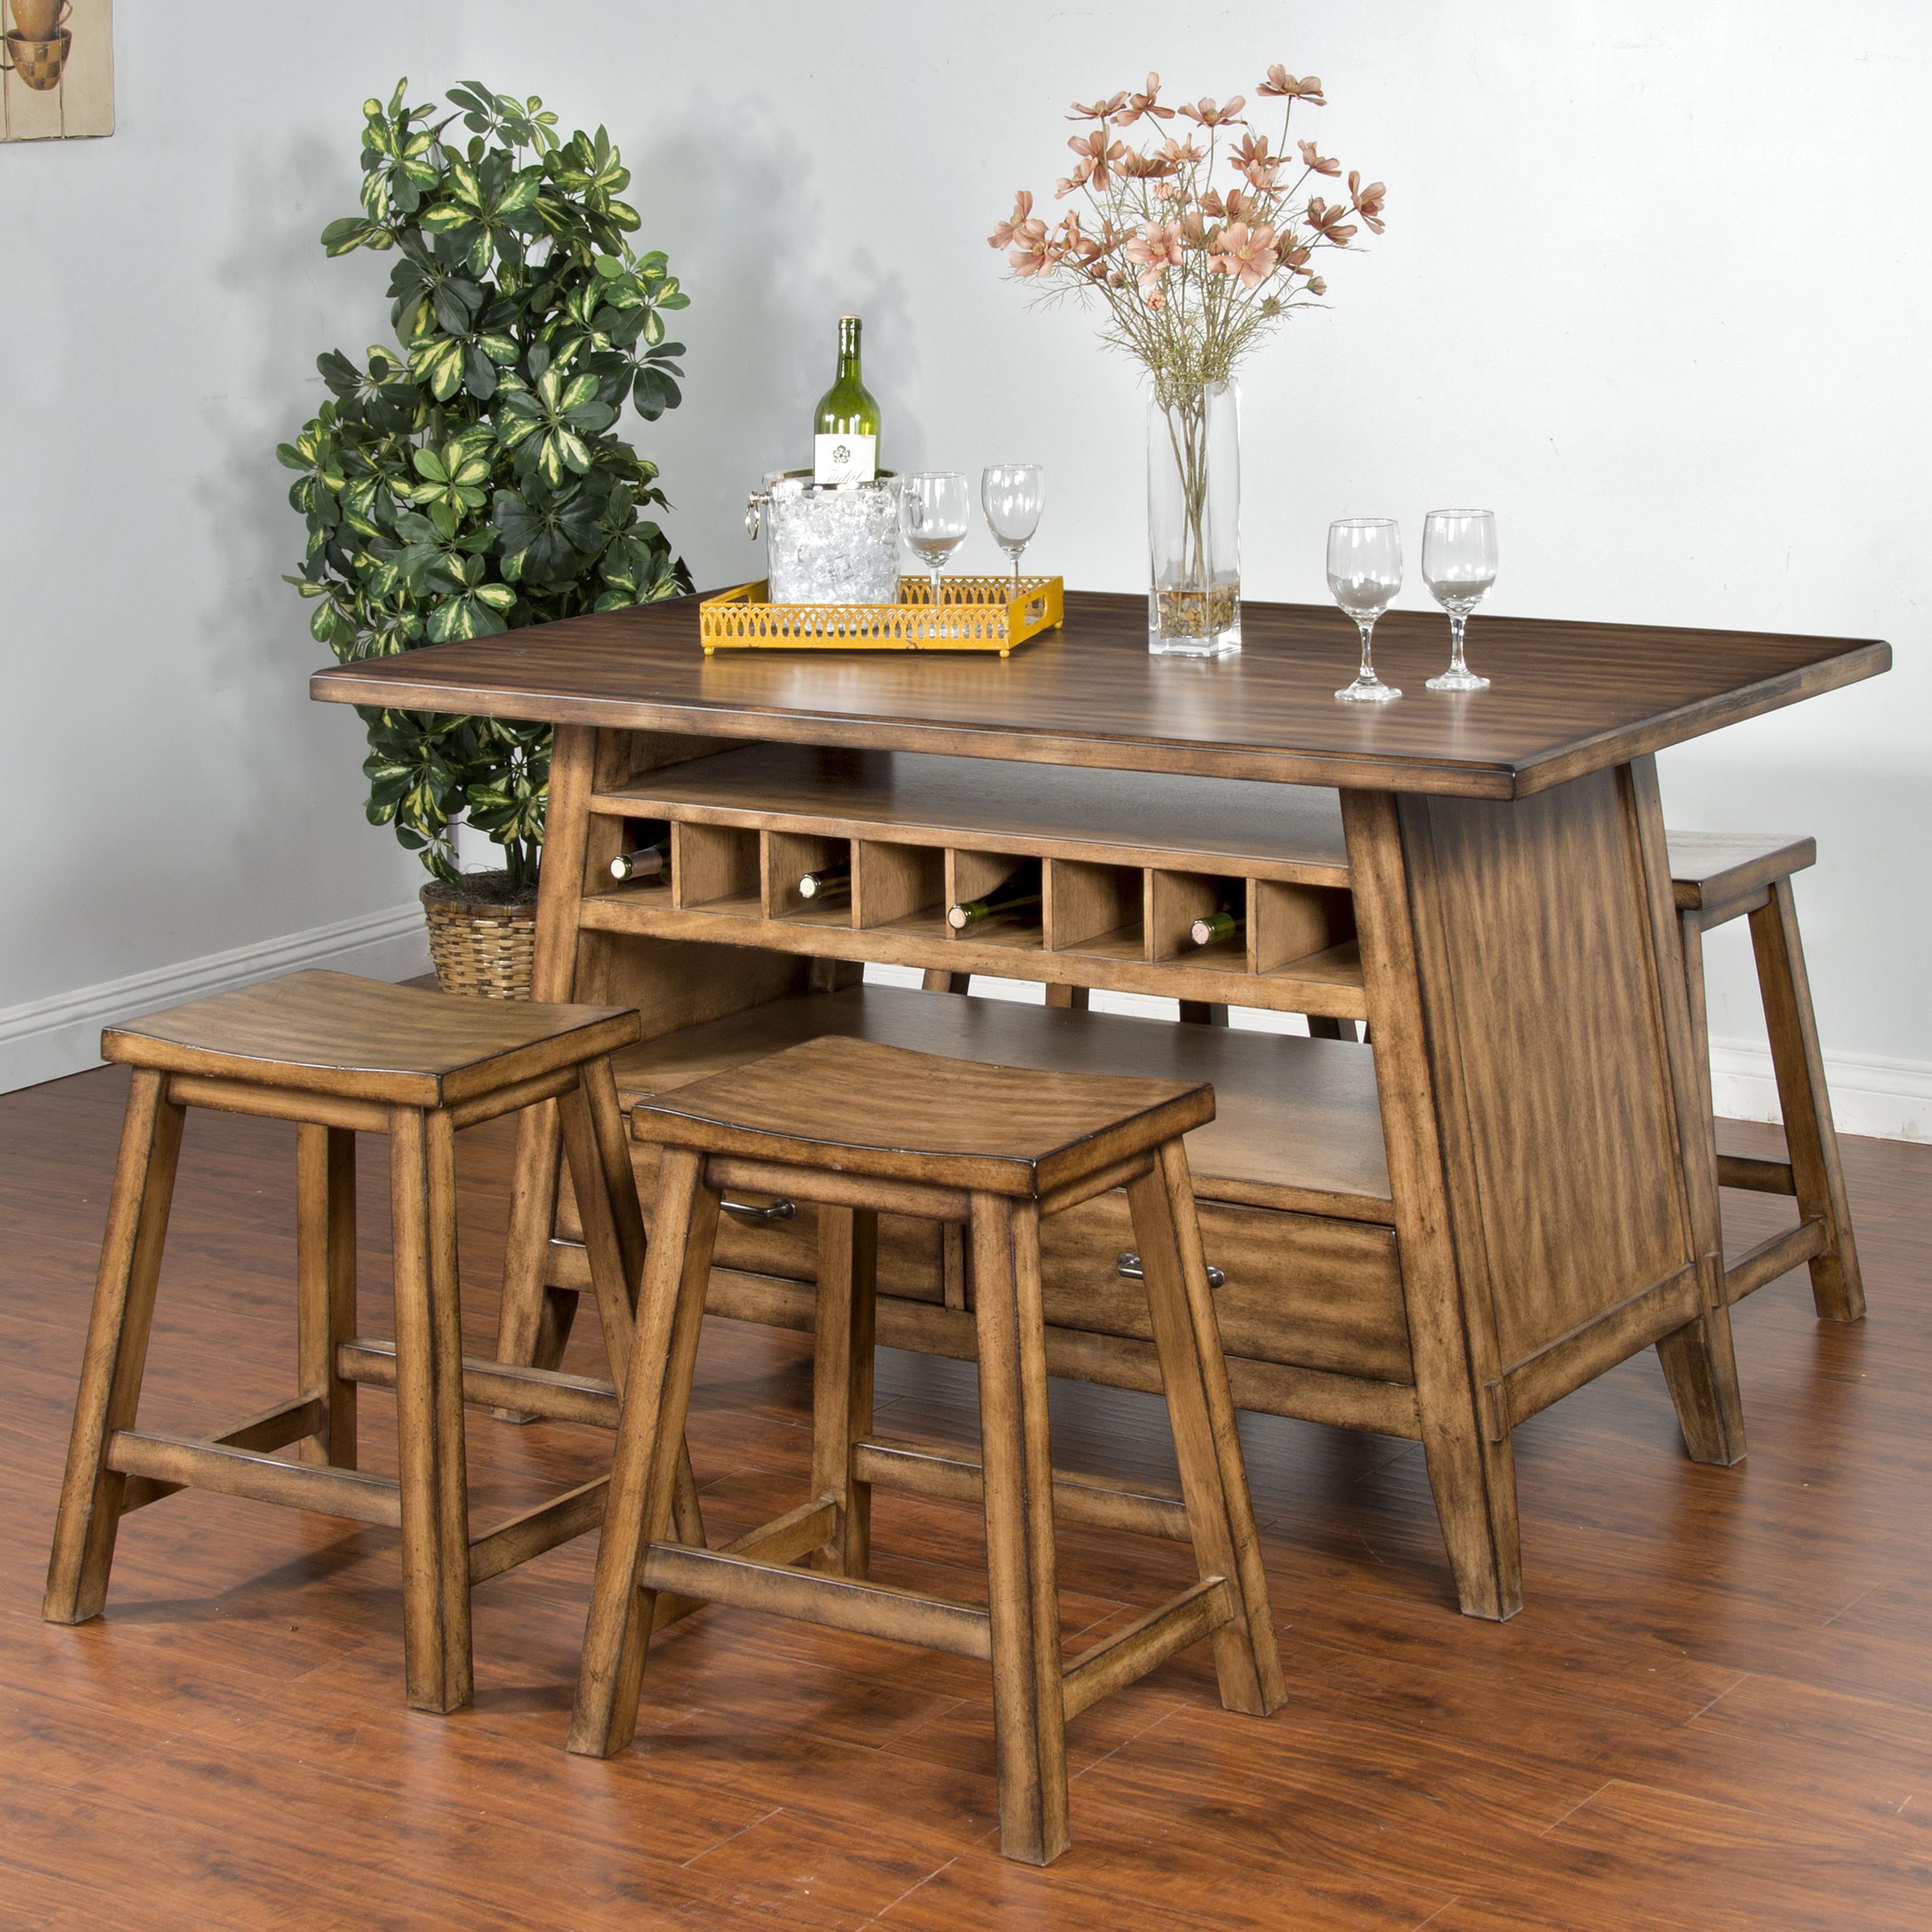 Sunny Designs Cornerstone 5-Piece Table with Storage Set - Item Number: 1398BM+4x1526BM-24